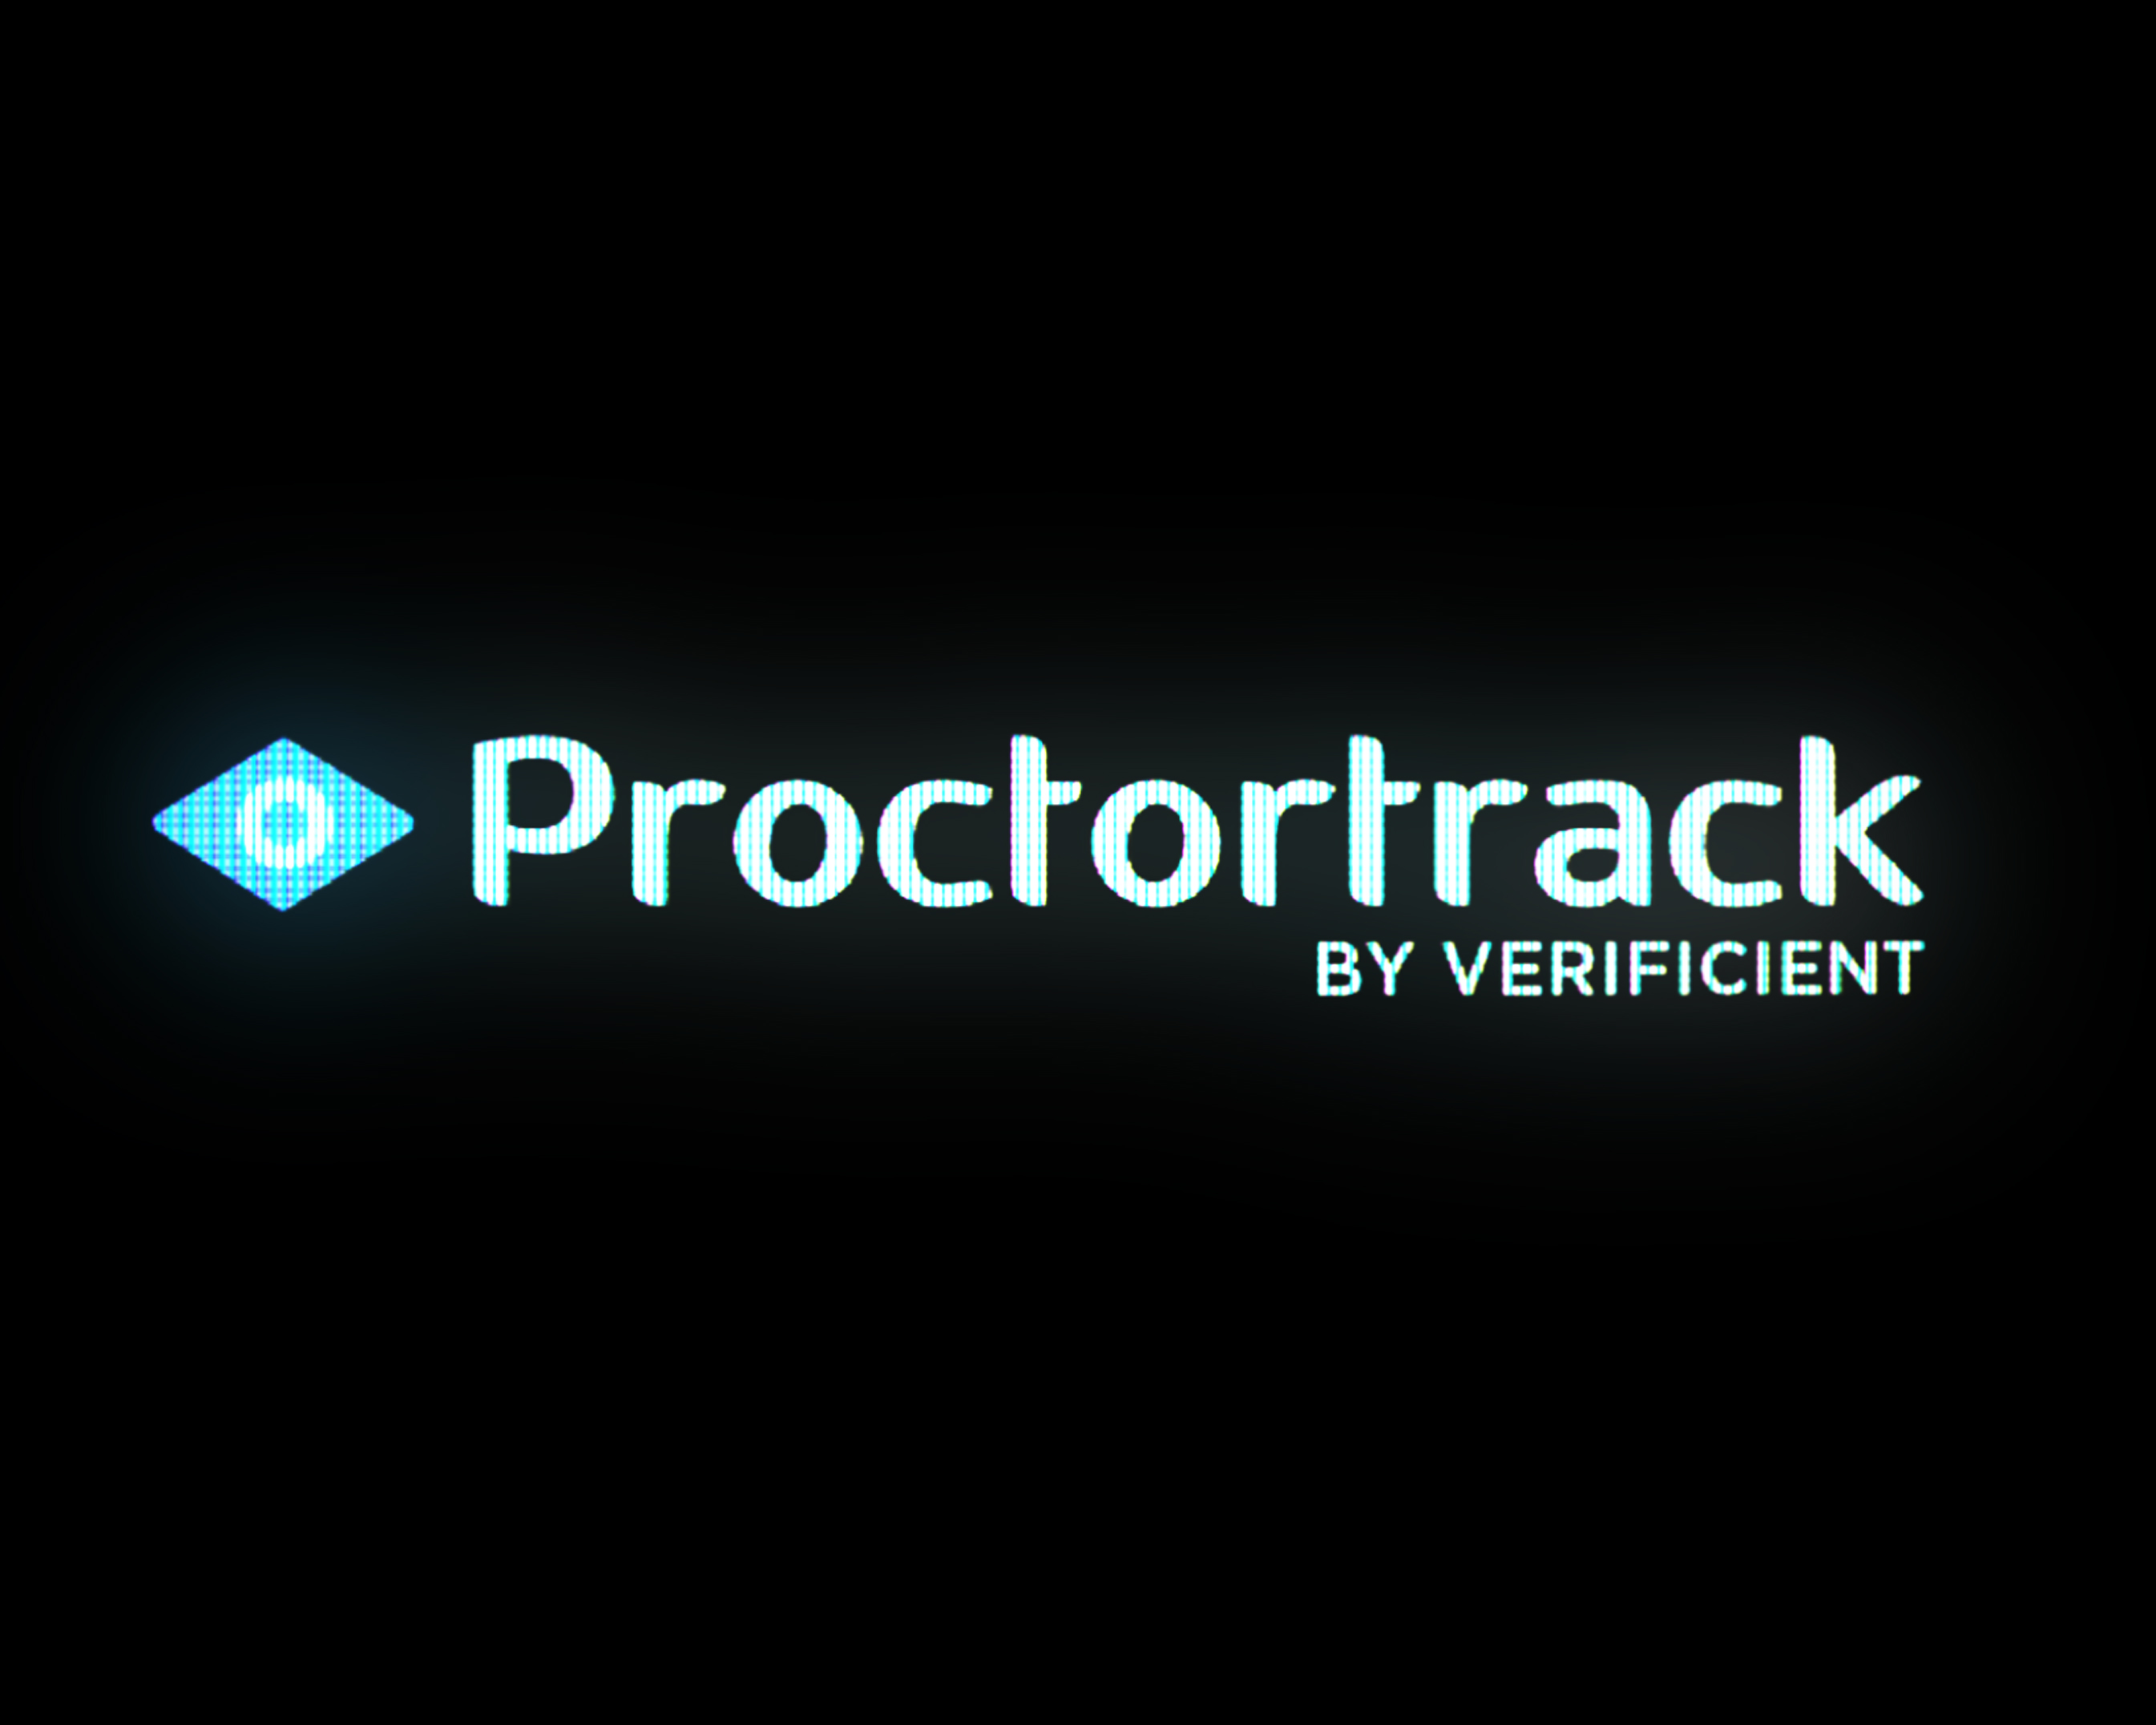 The Proctortrack logo.